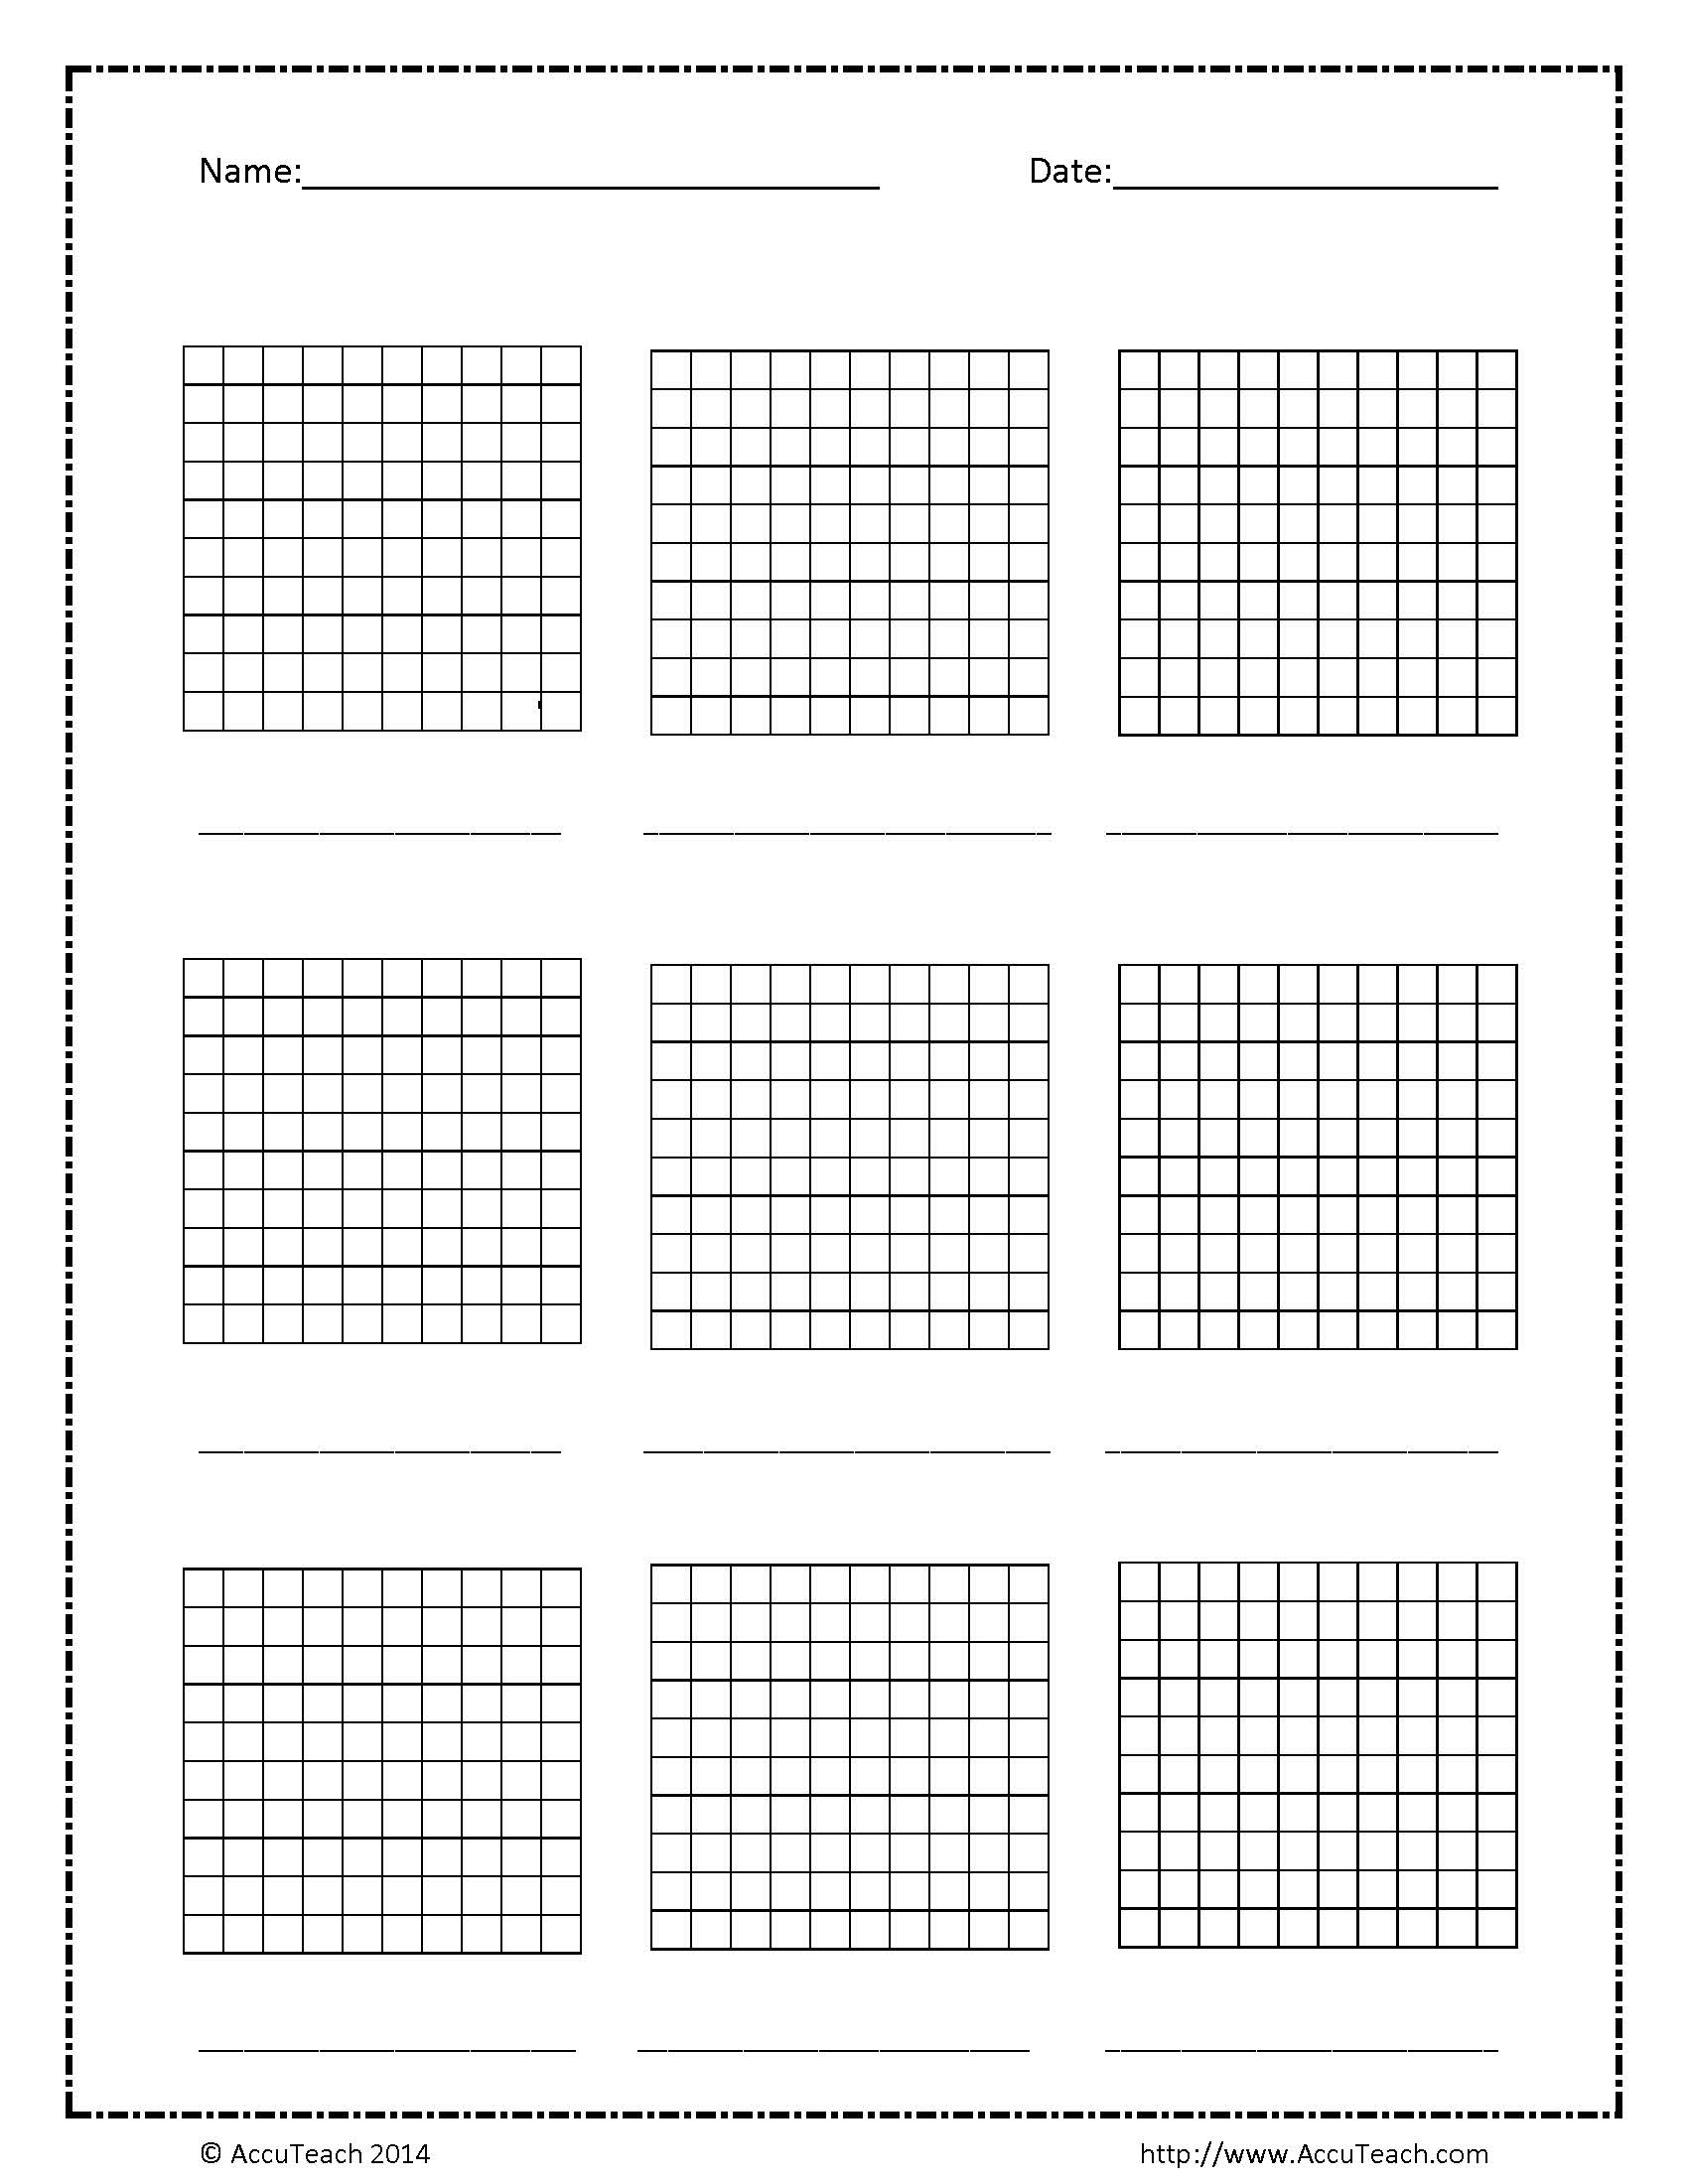 medium resolution of Blank Base Ten Hundreds Frame PDF - AccuTeach